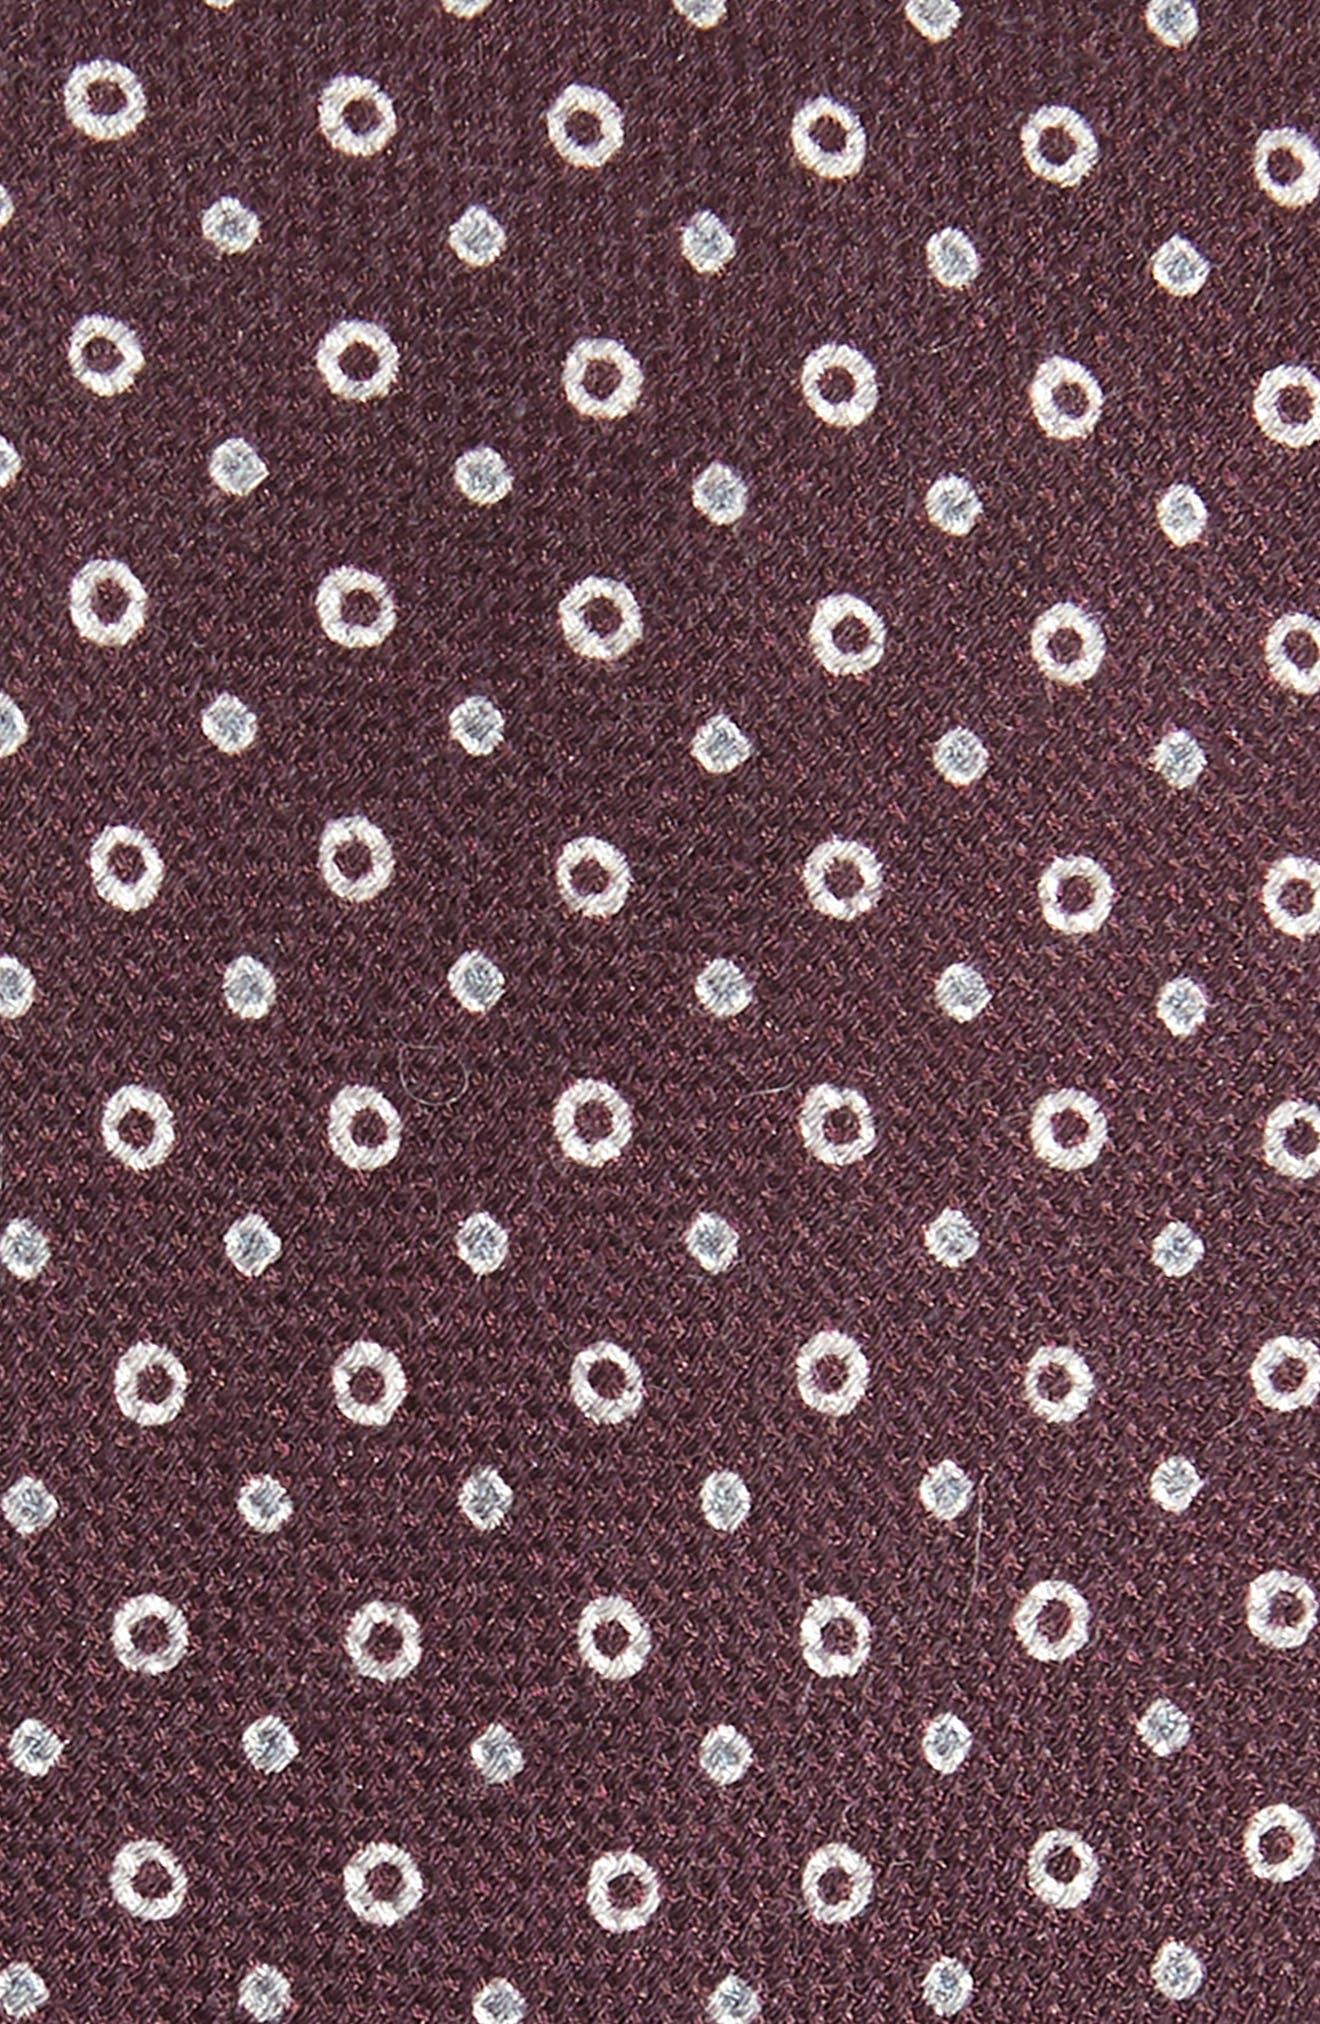 Dot Cotton & Silk Tie,                             Alternate thumbnail 2, color,                             DARK PURPLE